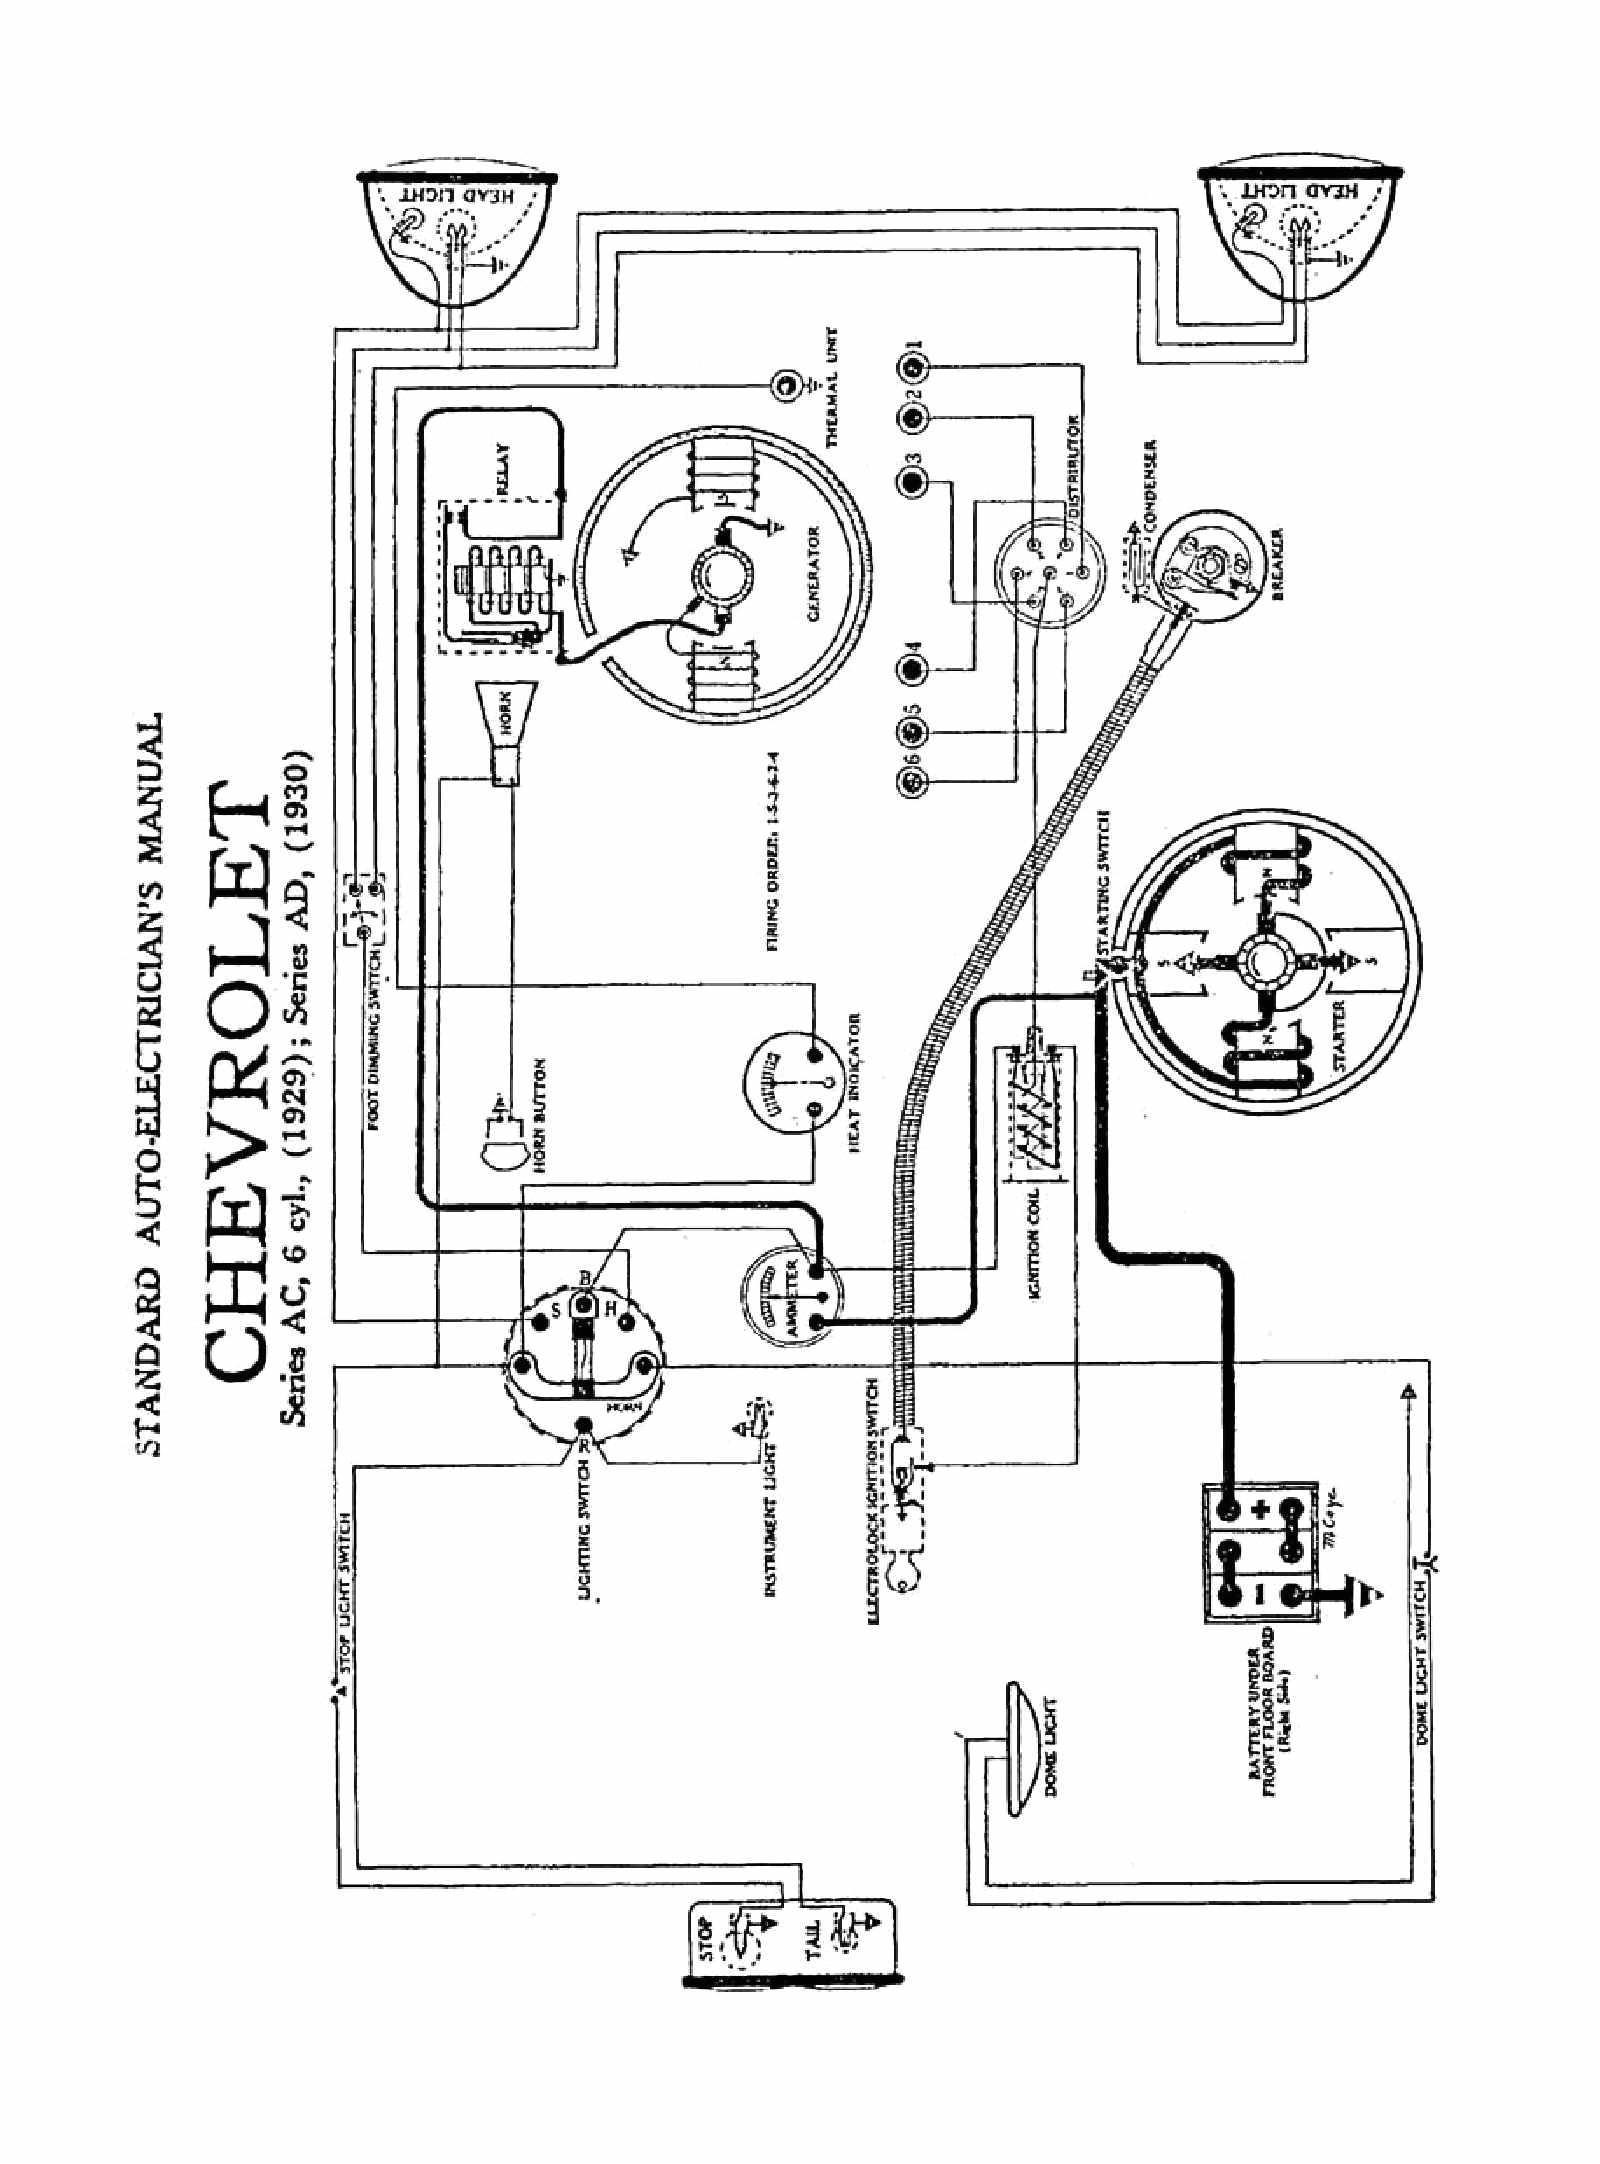 1951 olds wiring diagram data schematic diagram free oldsmobile wiring diagram